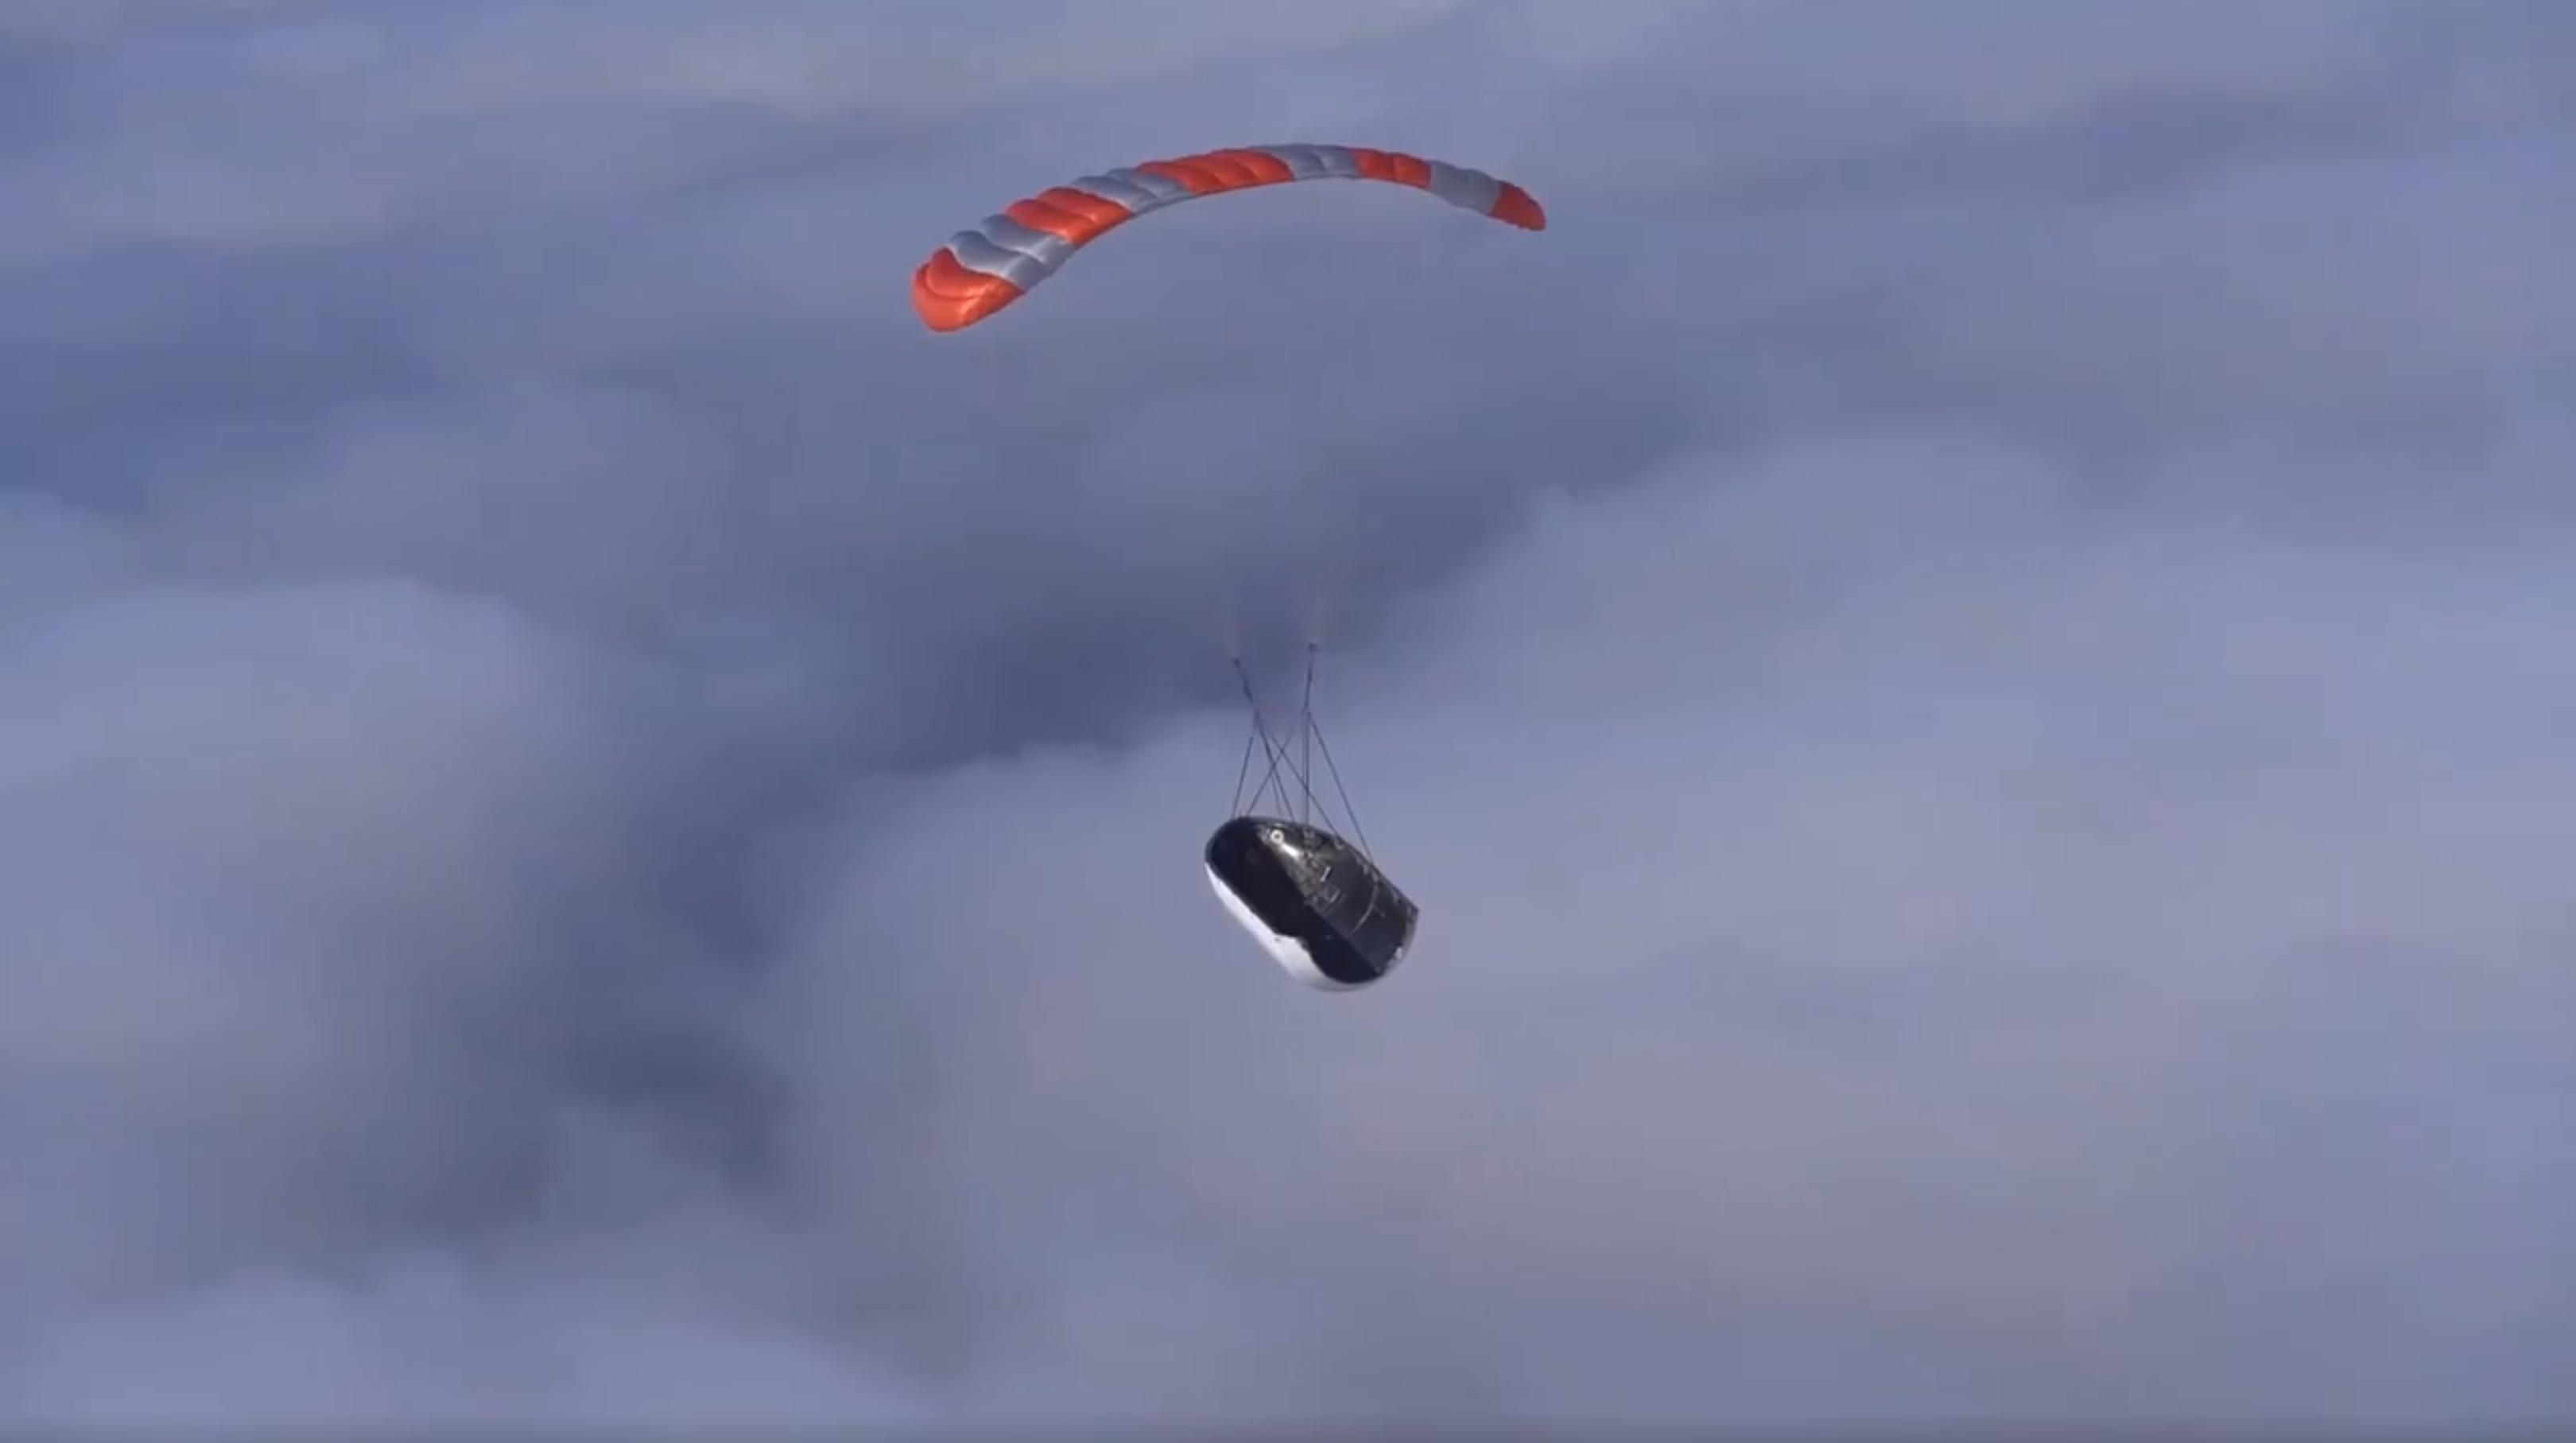 Mr Steven fairing drop test near miss Jan 2019 (SpaceX) 3